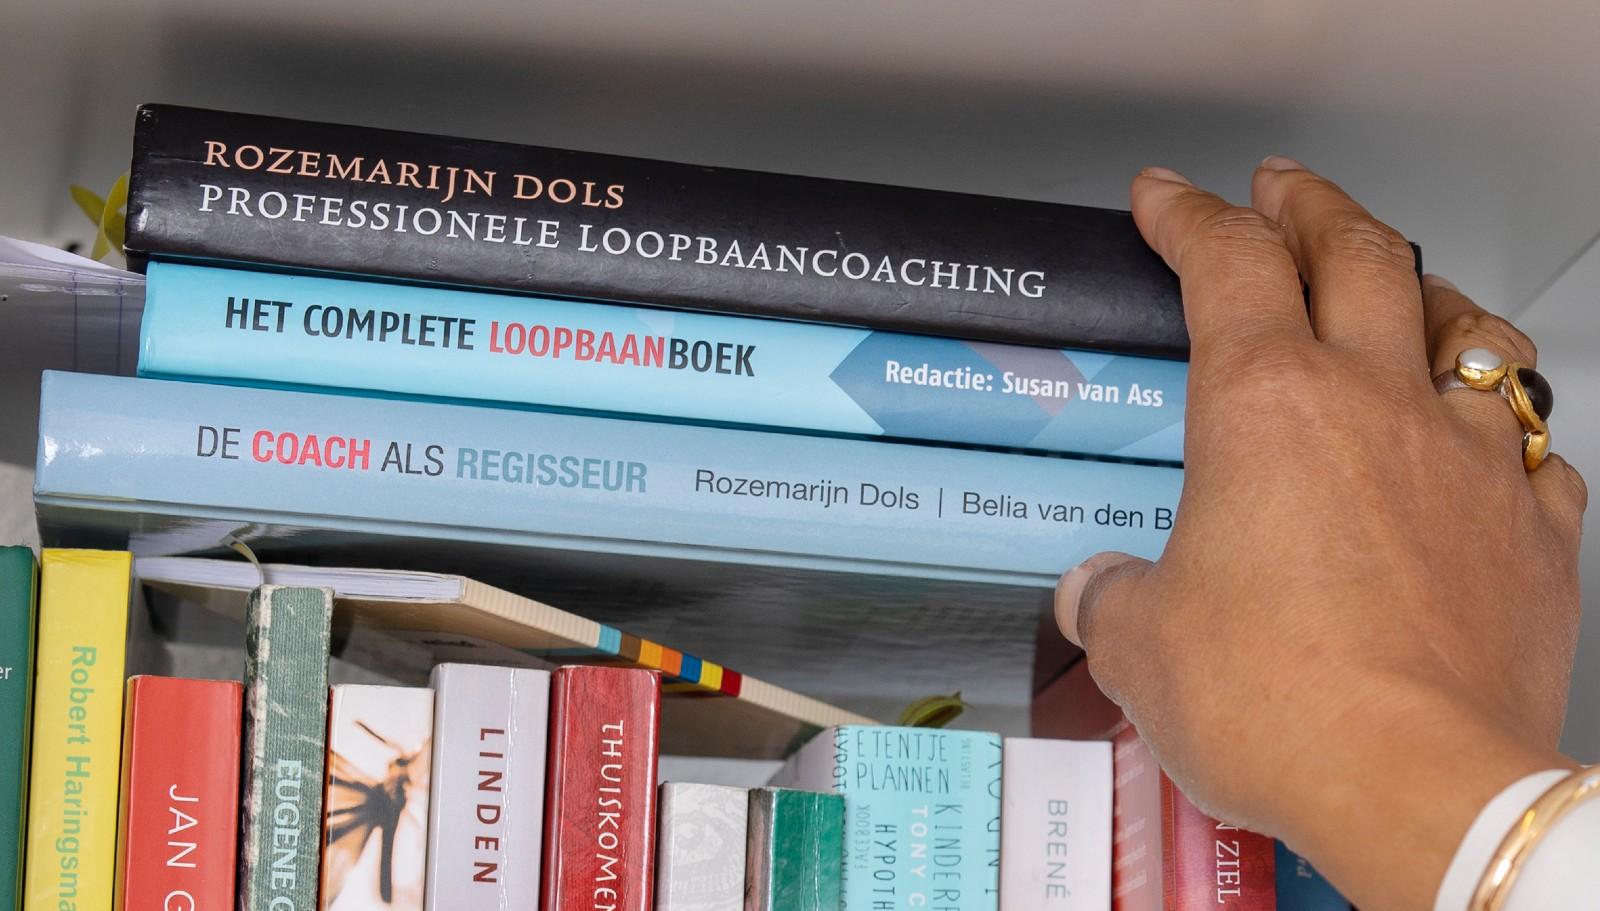 Boeken over loopbaancoaching